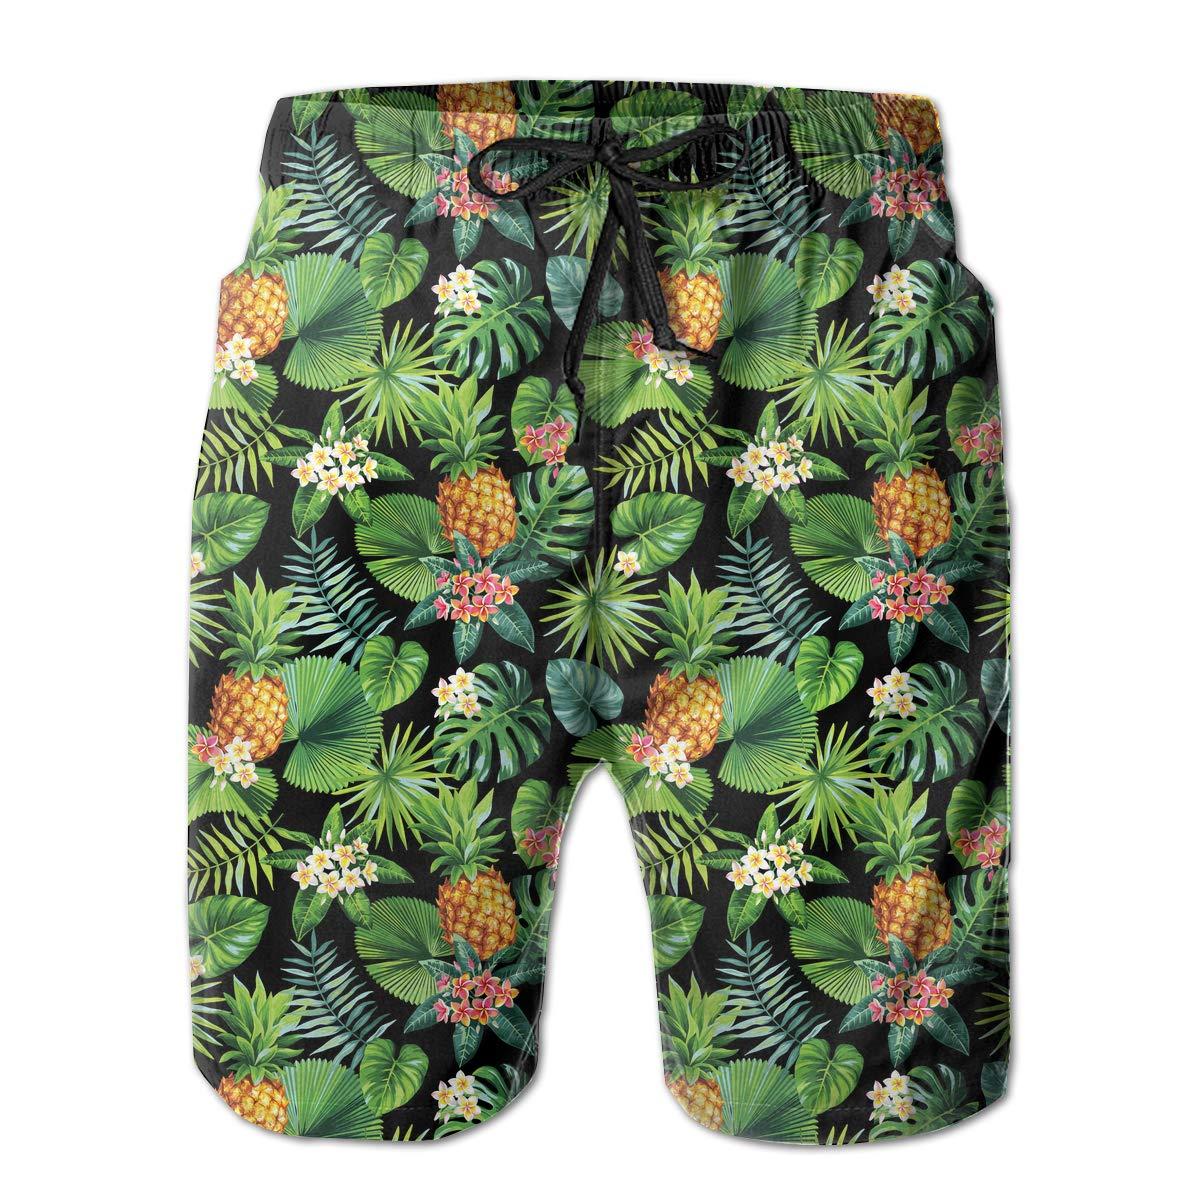 Xk7@KU Mens Athletic Beach Shorts Polyester Hawaiian Pineapples Pattern Beachwear with Pockets